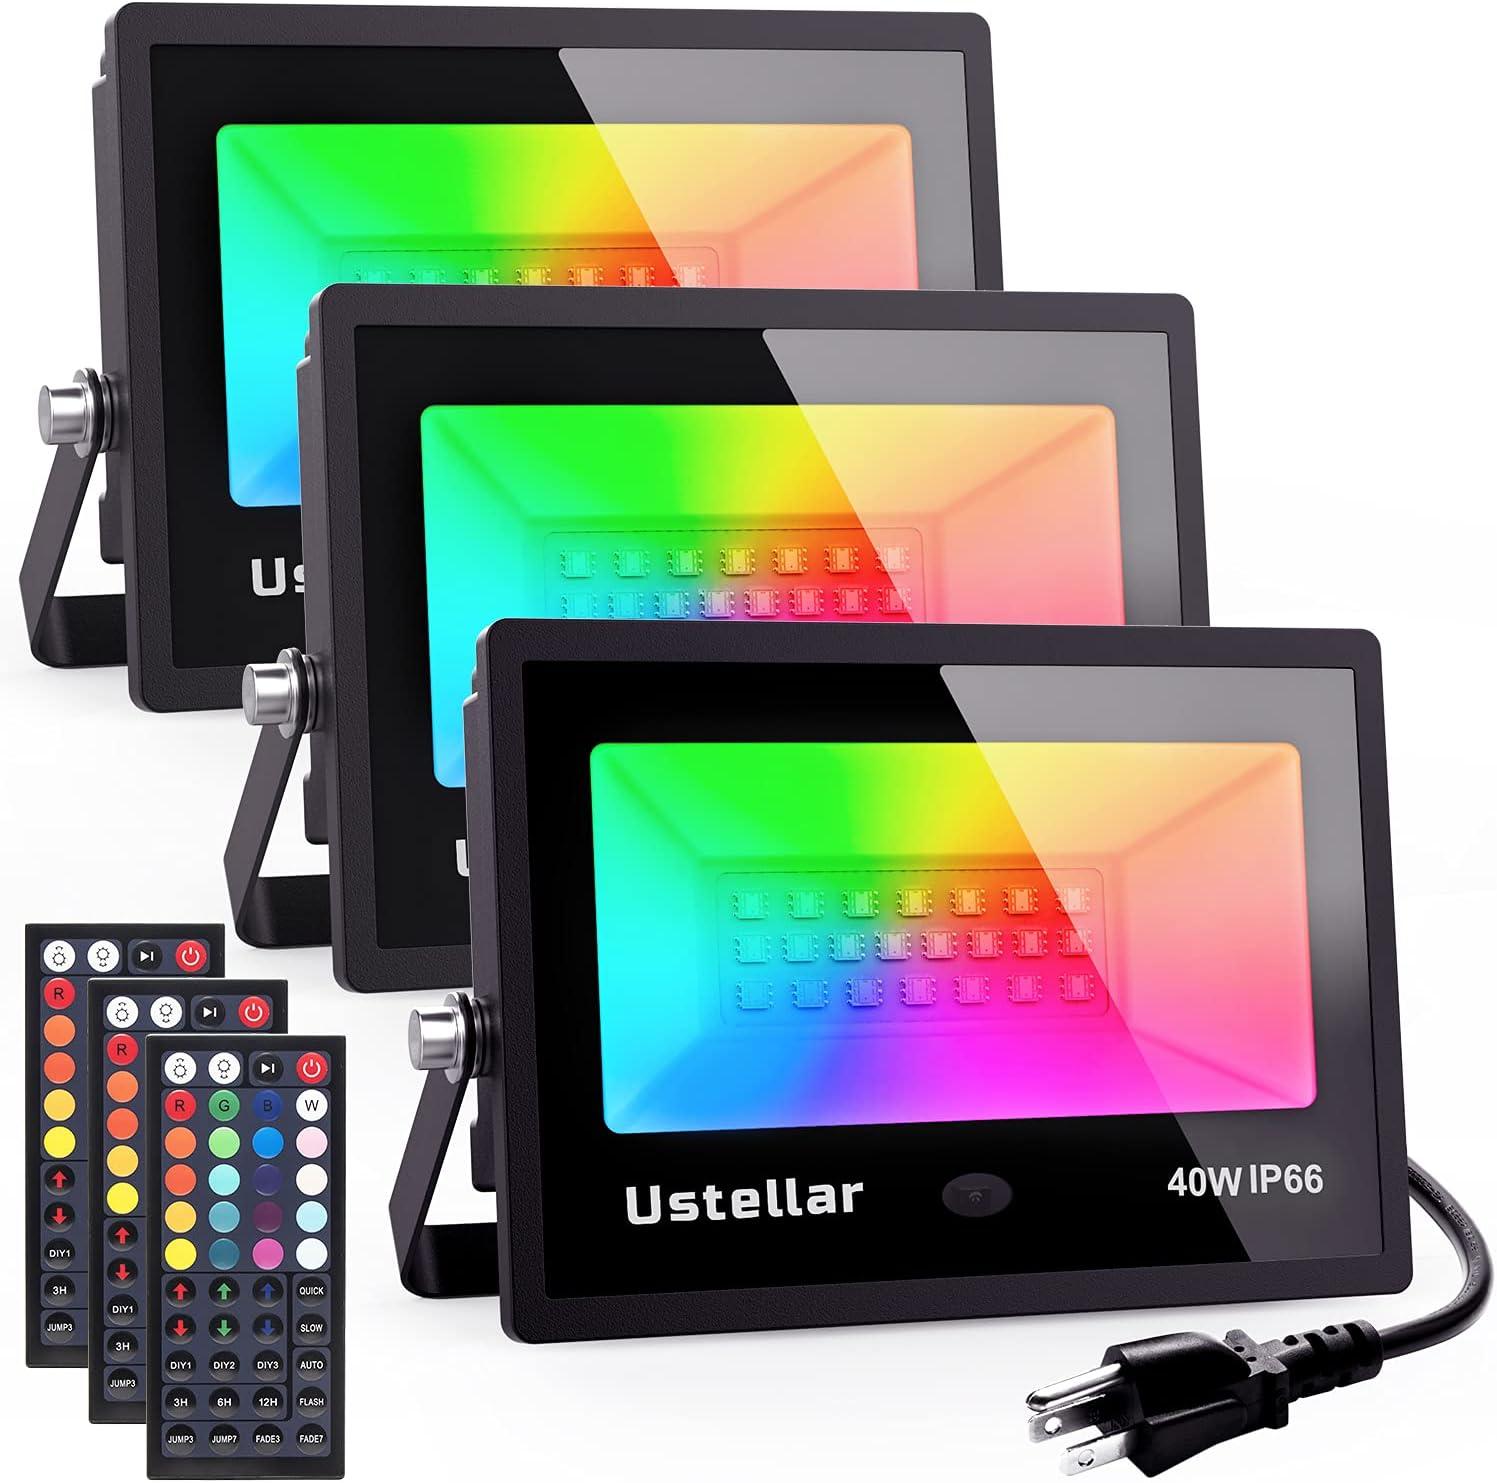 Ustellar 3 Pack 40w RGB Lights Max 68% OFF Decoratio Flood Outdoor Luxury goods Halloween